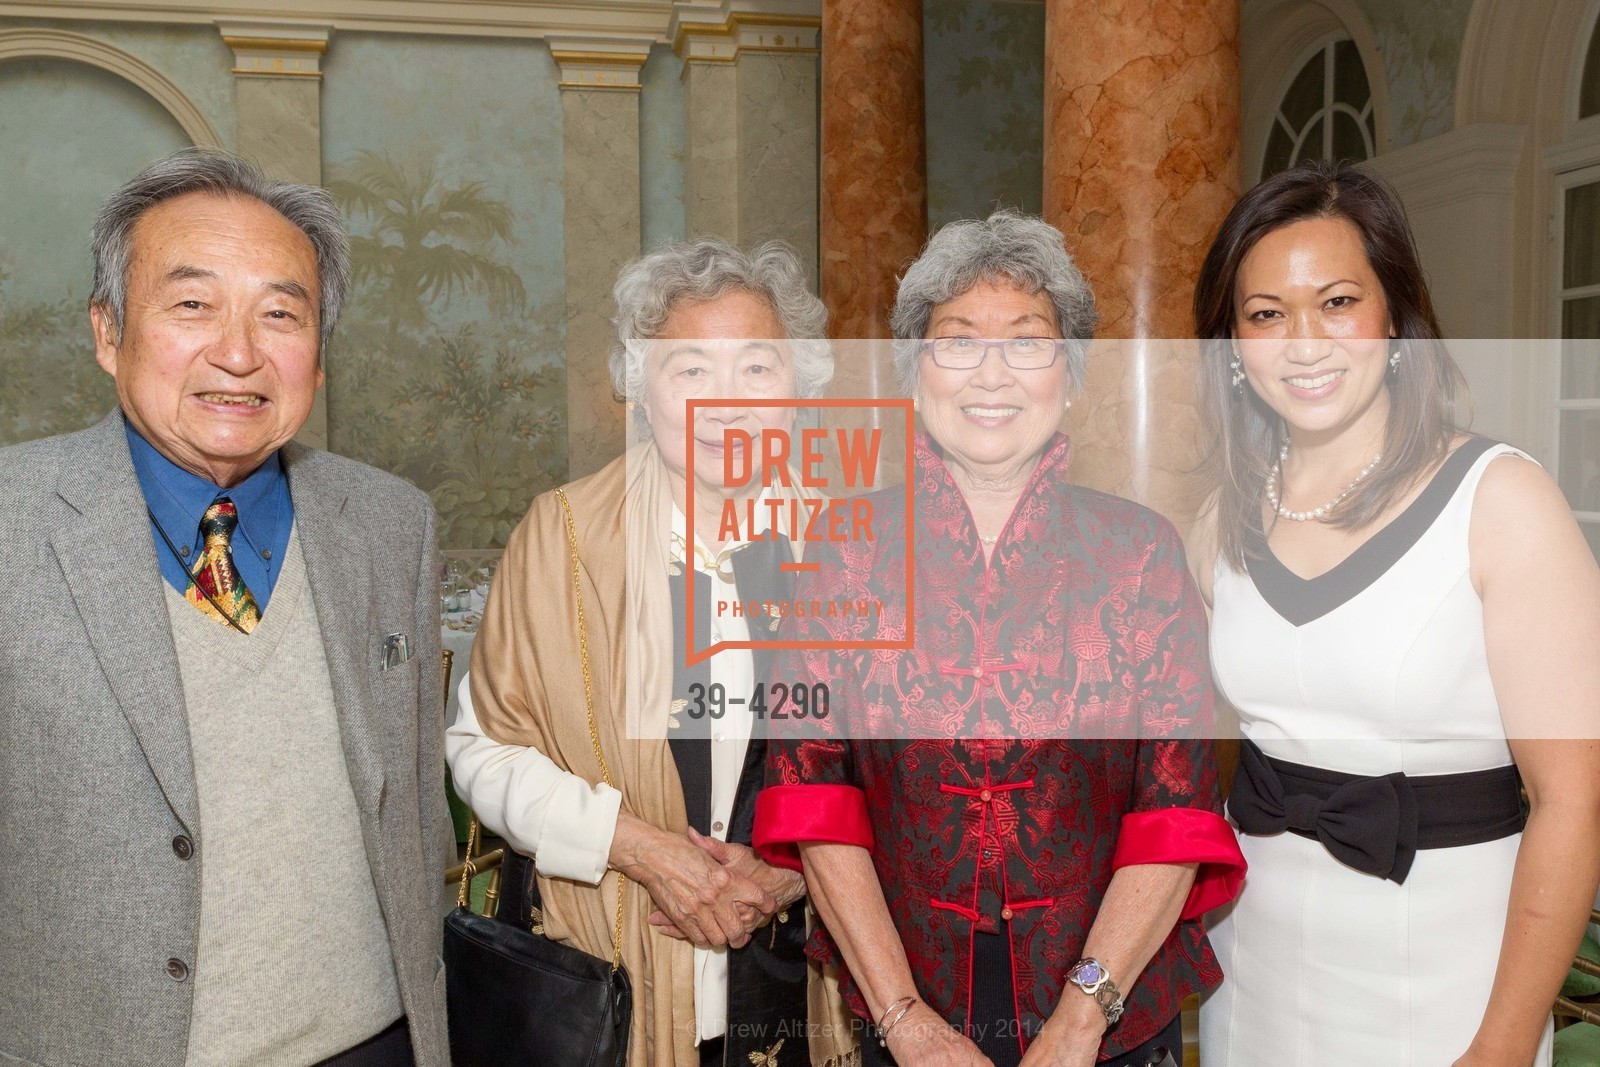 Kenneth Mei, Bettine Kuh, Diana Chua, Cynthia Mei, Photo #39-4290